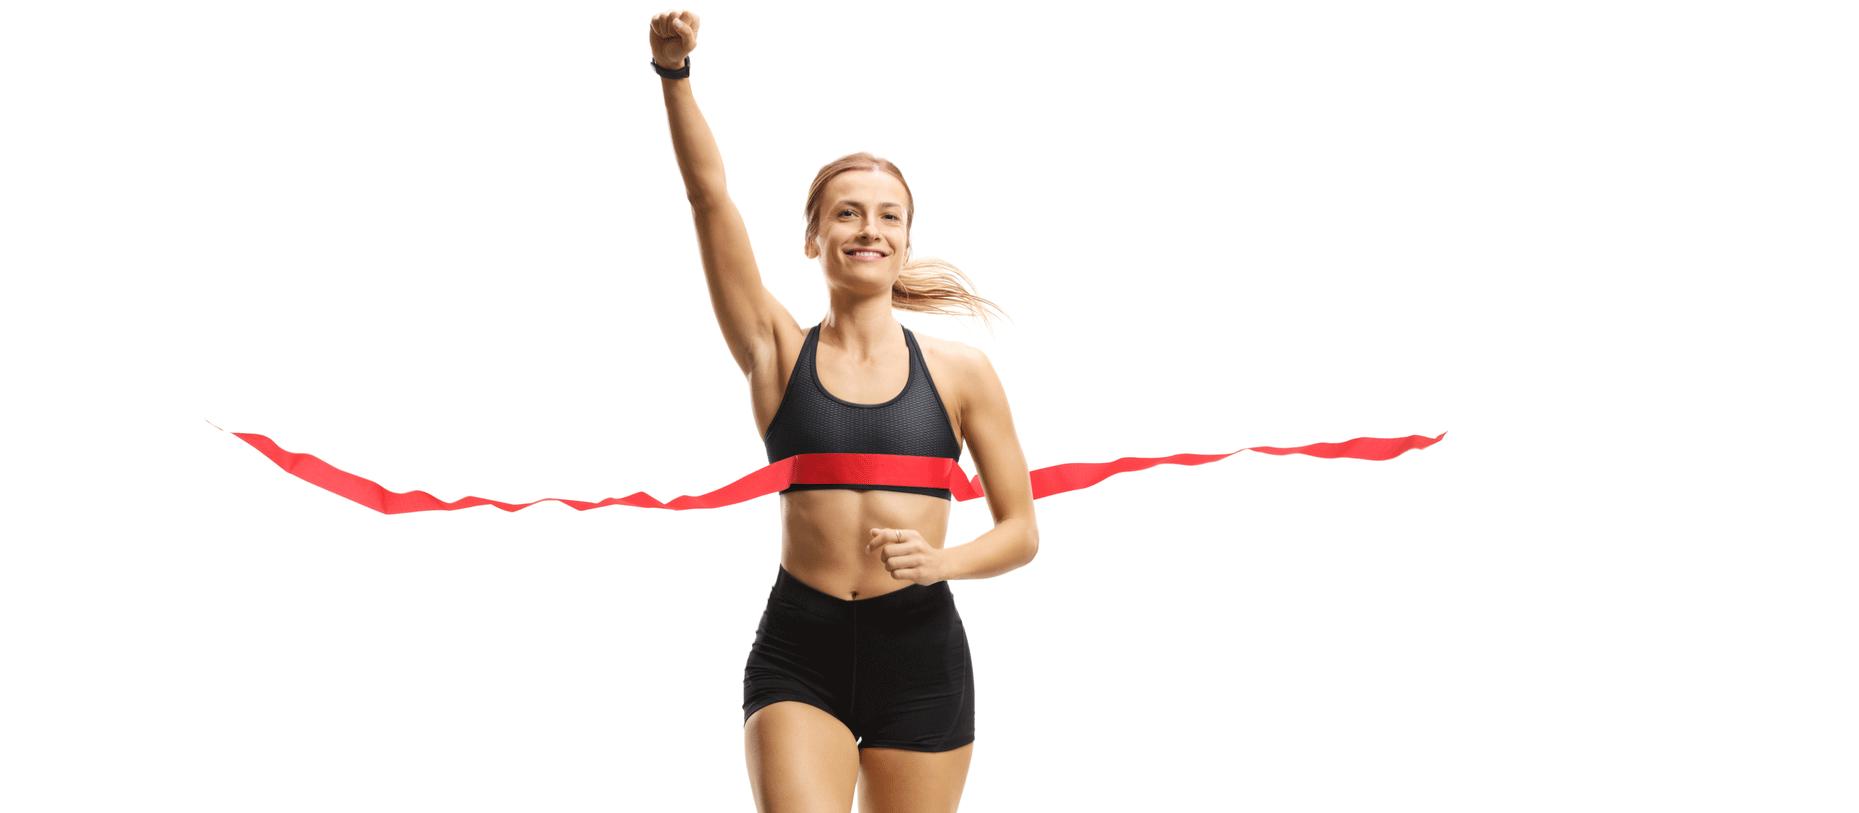 tips for long distance runs